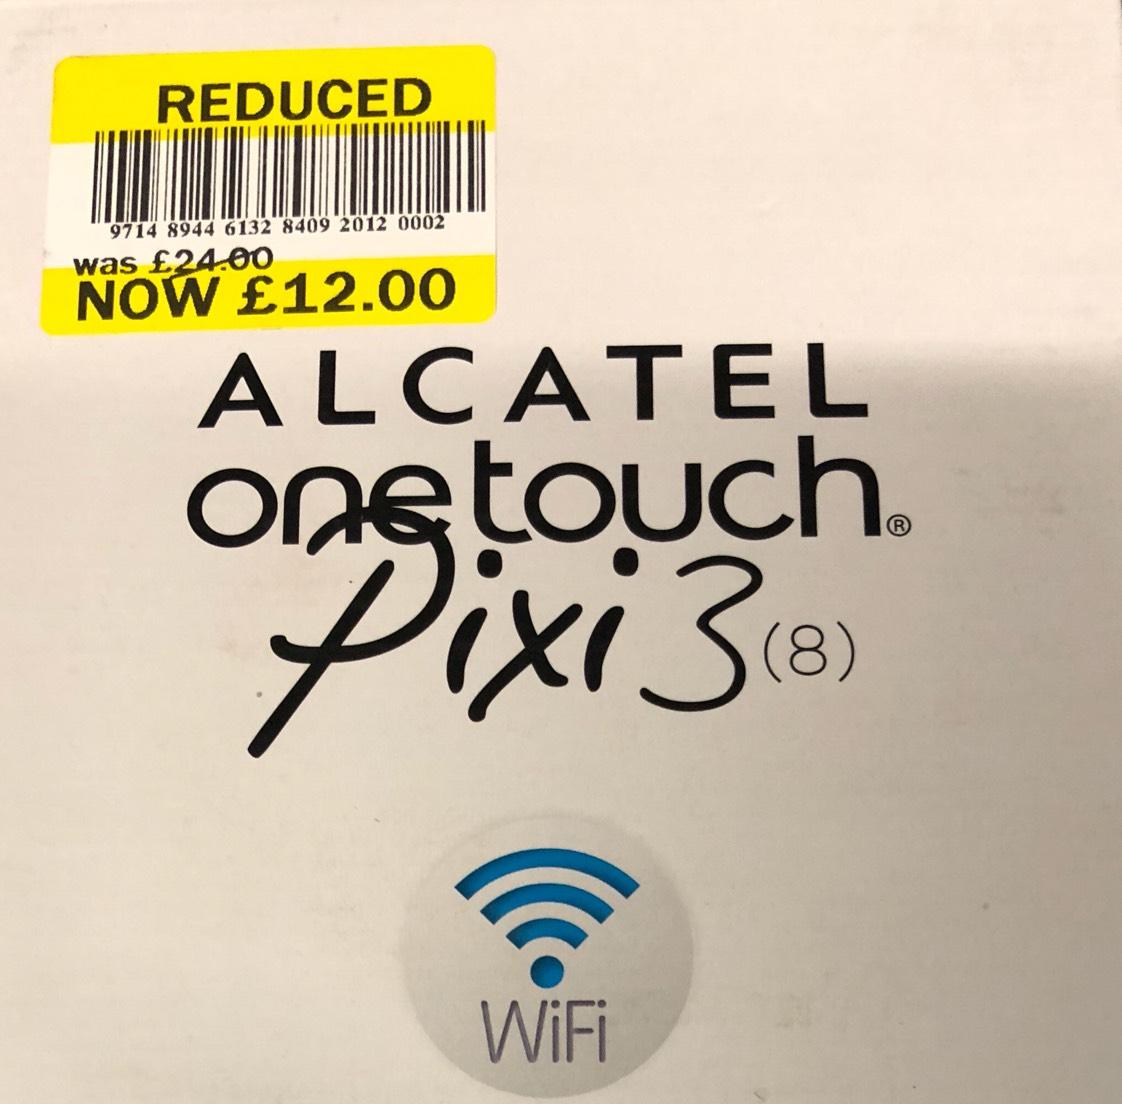 "Alcatel one touch pixi 3 8"" tablet £12 - in store - Tesco (Bradley Stoke)"